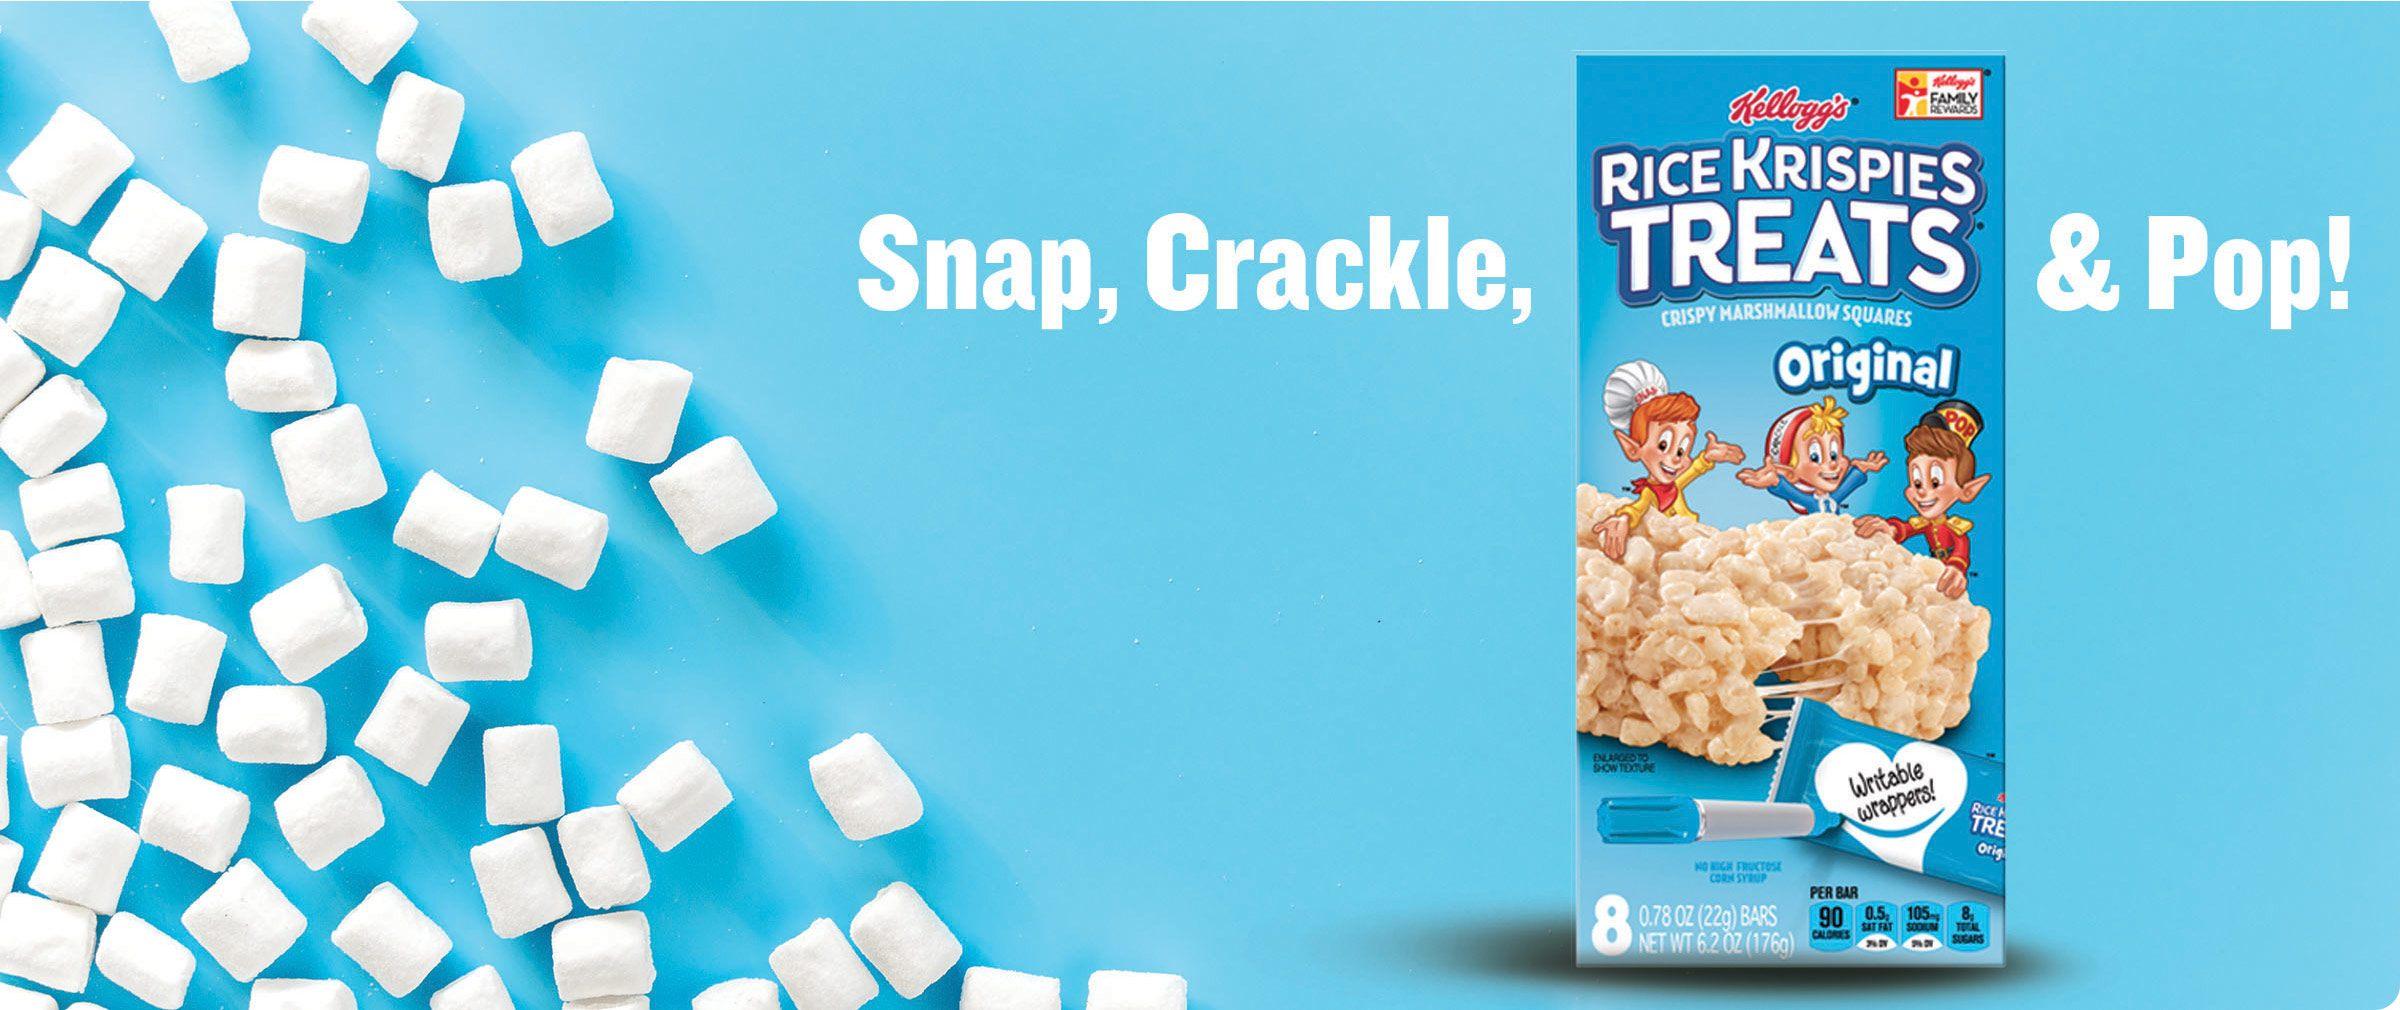 RiceKrispies_B2S-webslider-JSF